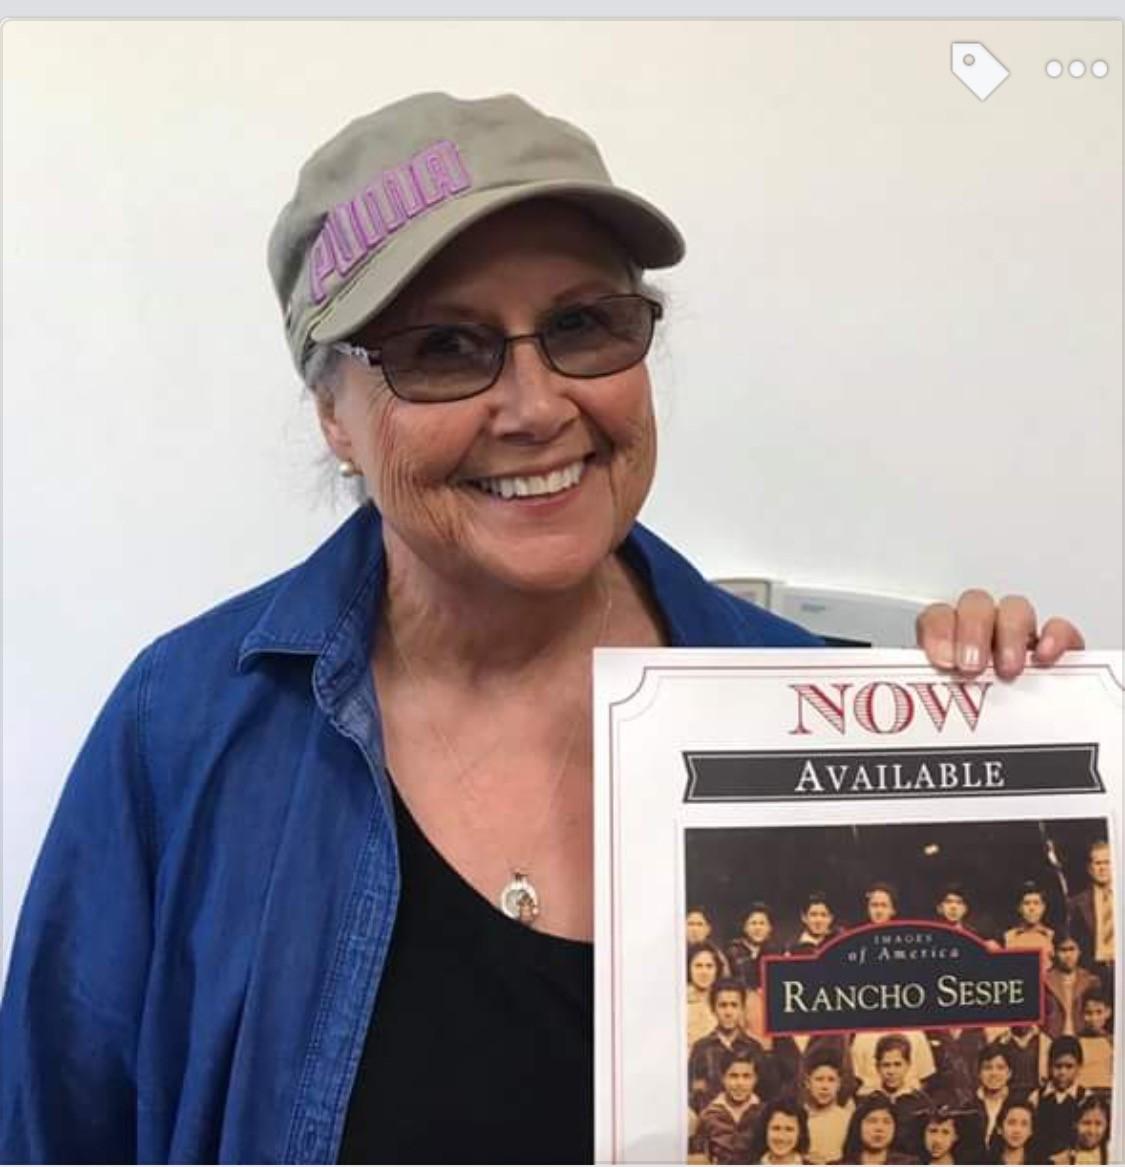 Rancho Sespe Book Signing August 26, 2017.jpg